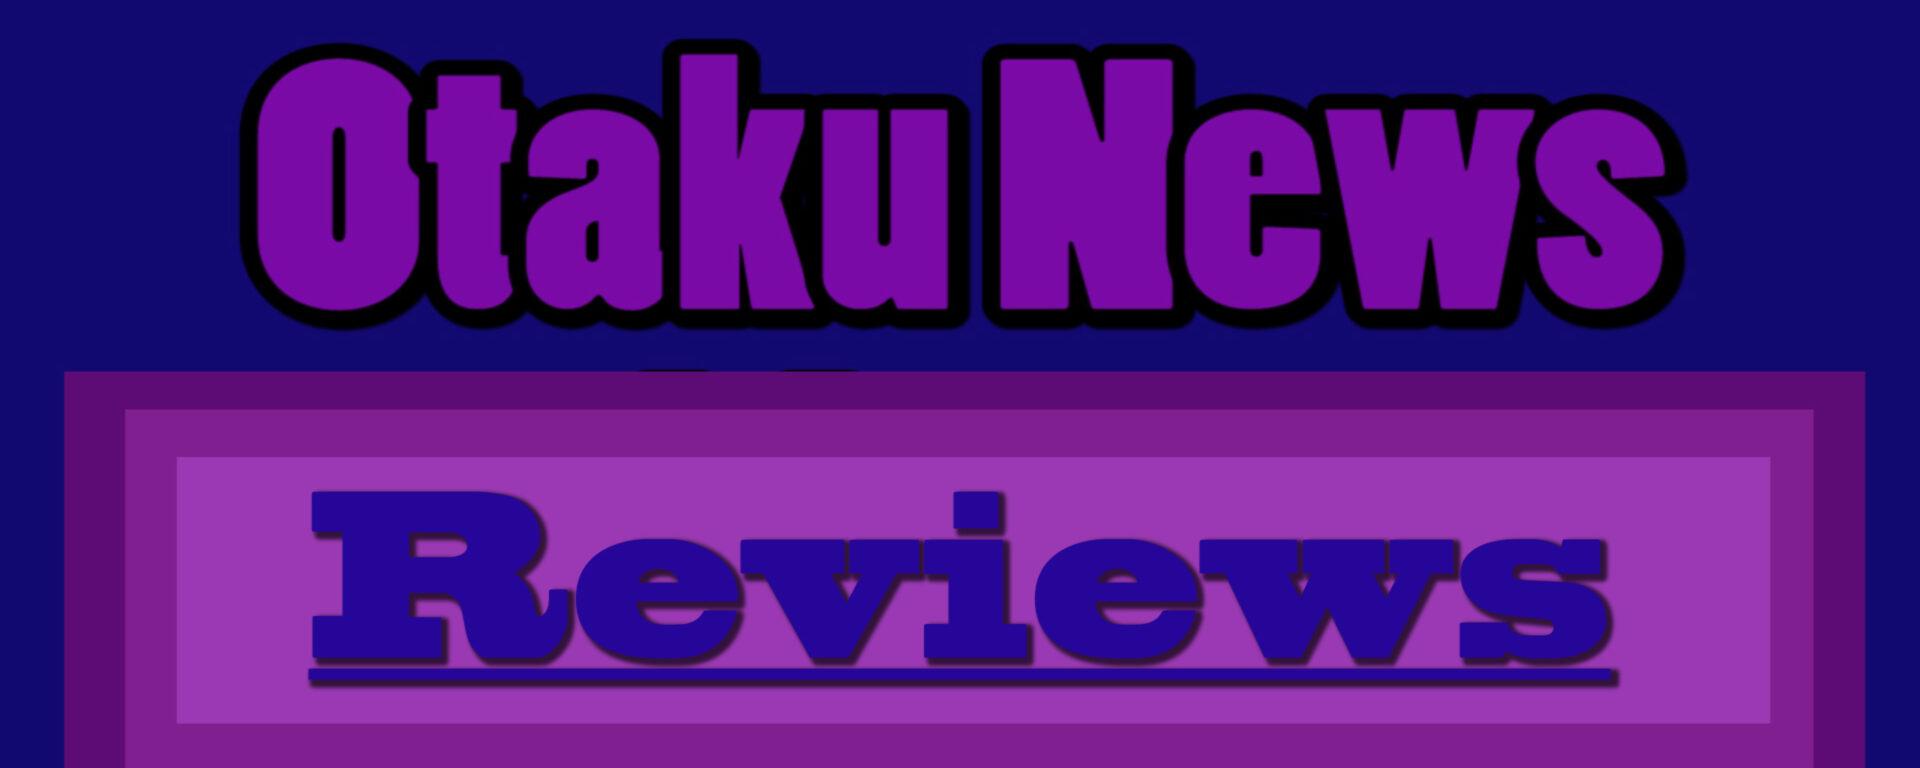 From Ashe Volume 1 by Joshua Piedra – Otaku News Reviews